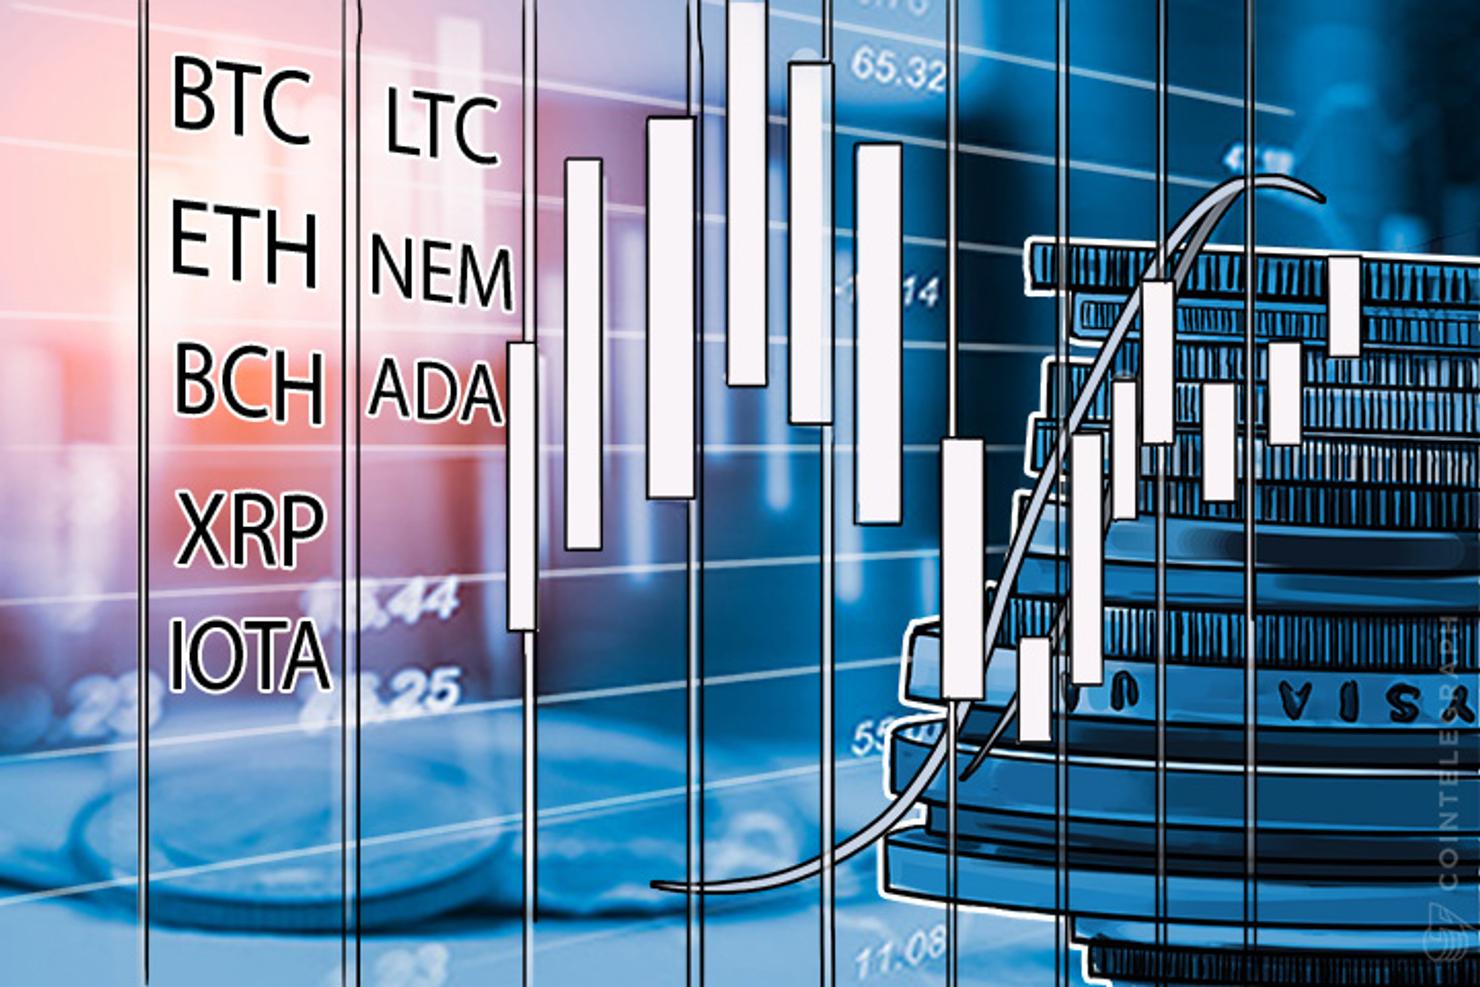 Price Analysis, Jan. 06: Bitcoin, Ethereum, Bitcoin Cash, Ripple, IOTA, Litecoin, NEM, Cardano